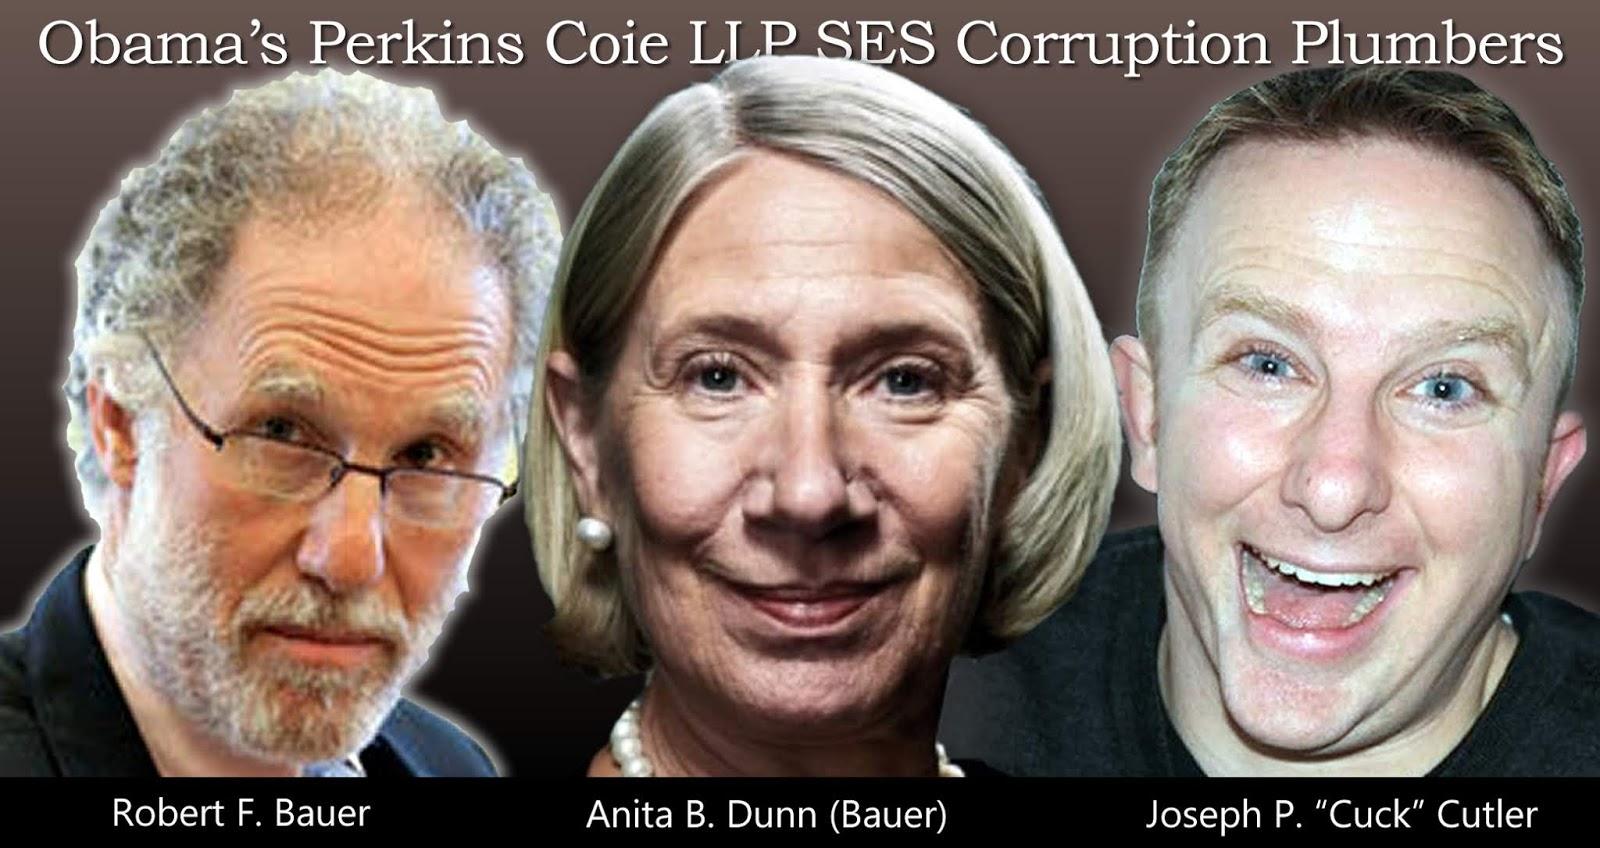 Obama's Perkins Coie LLP SES Hit Squad: Robert F. Bauer, Anita B. Dunn (Bauer), Joseph P. 'Cuck' Cutler